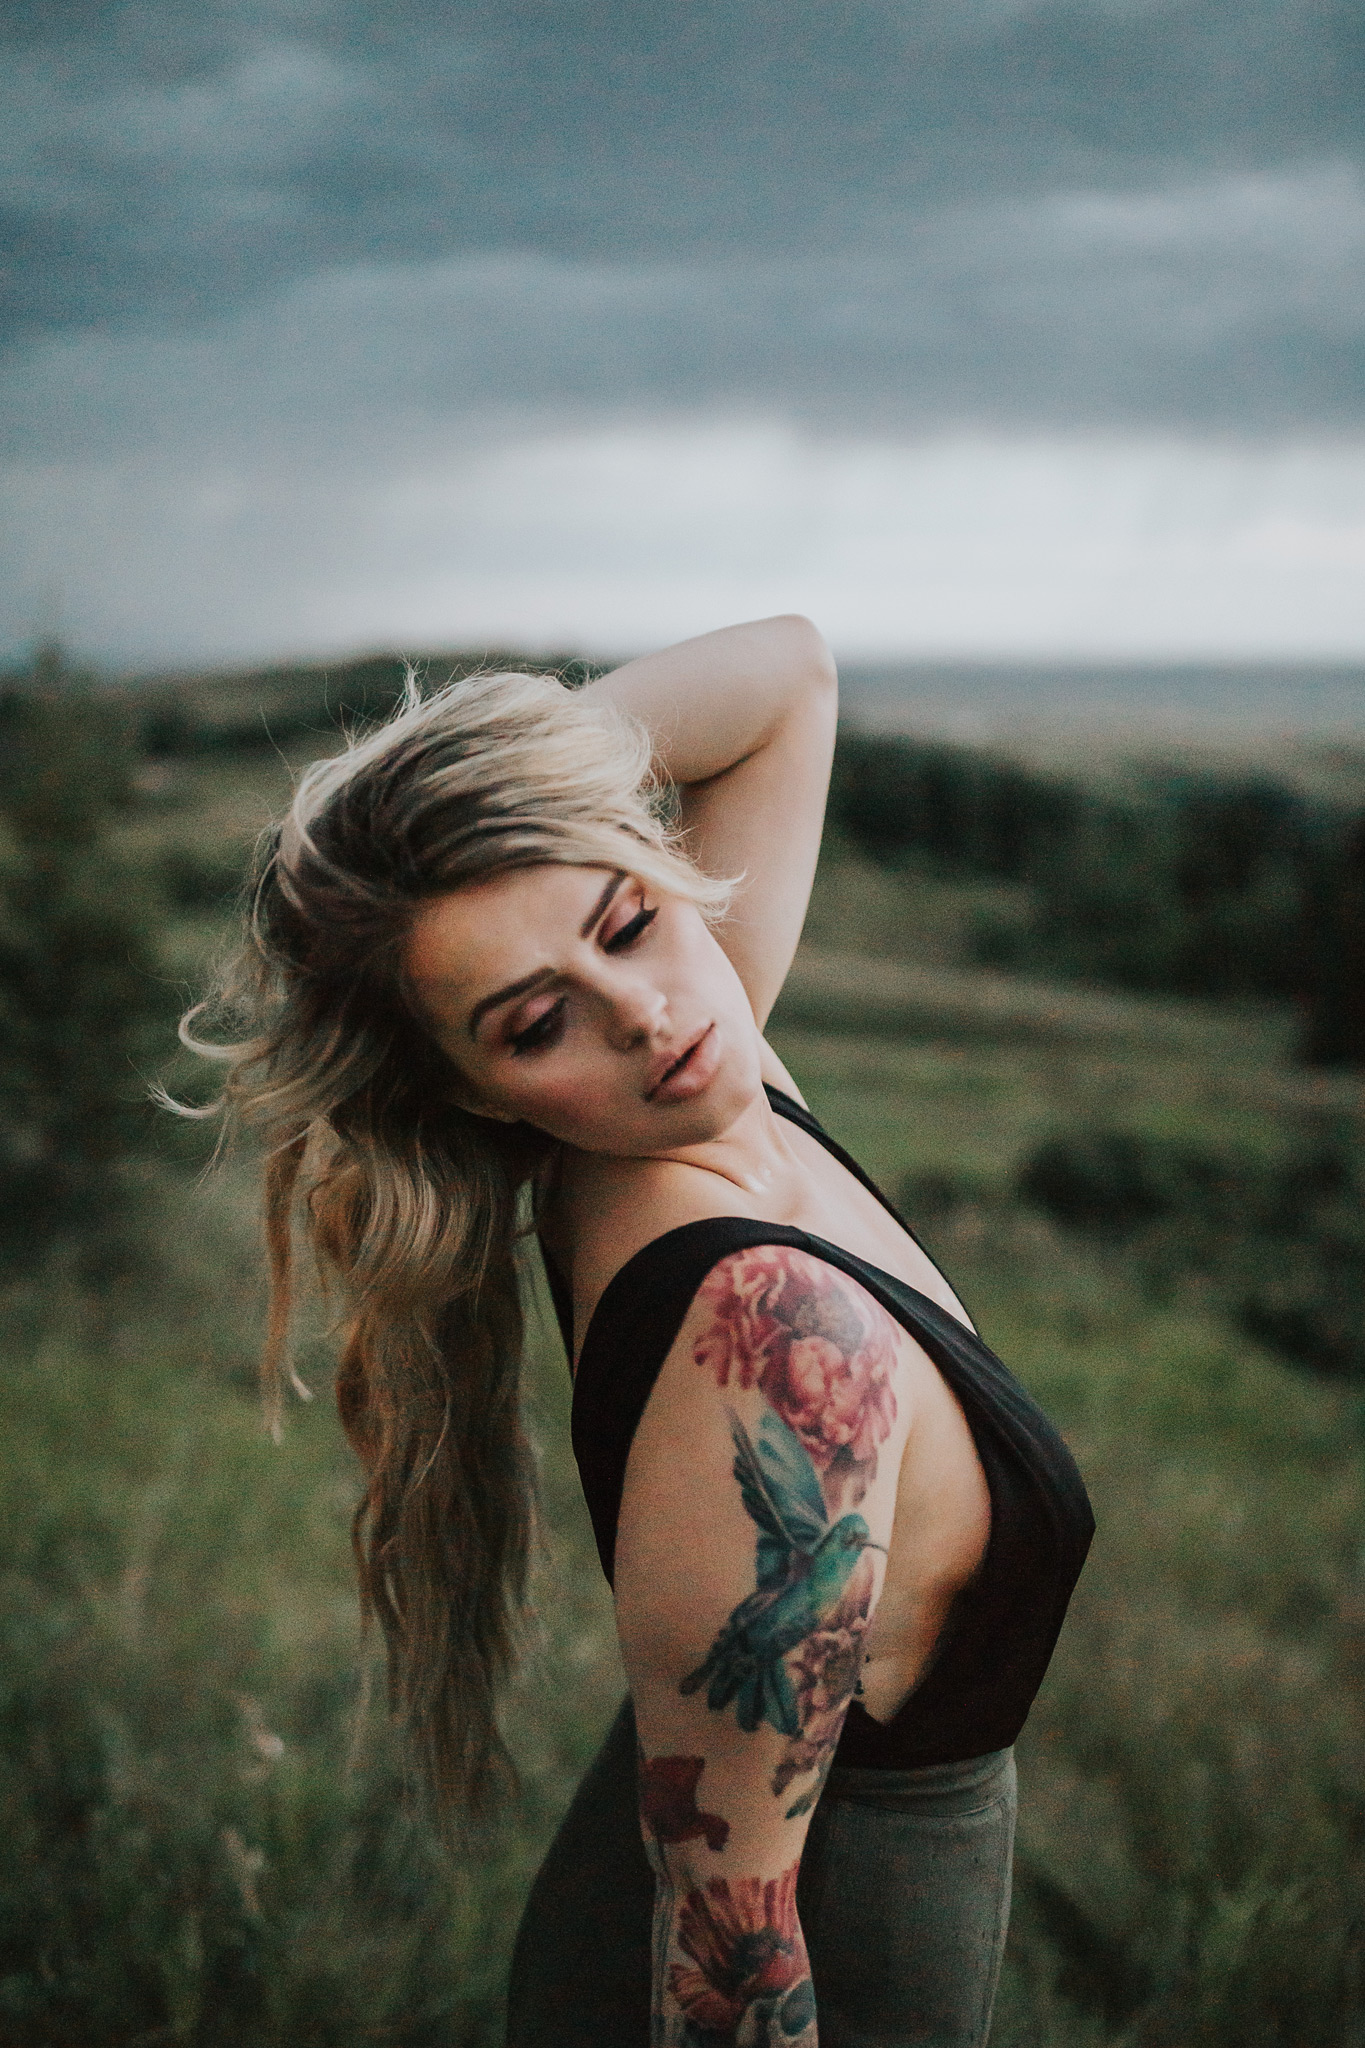 woman posing hand in hair reesor lake alberta portrait photography